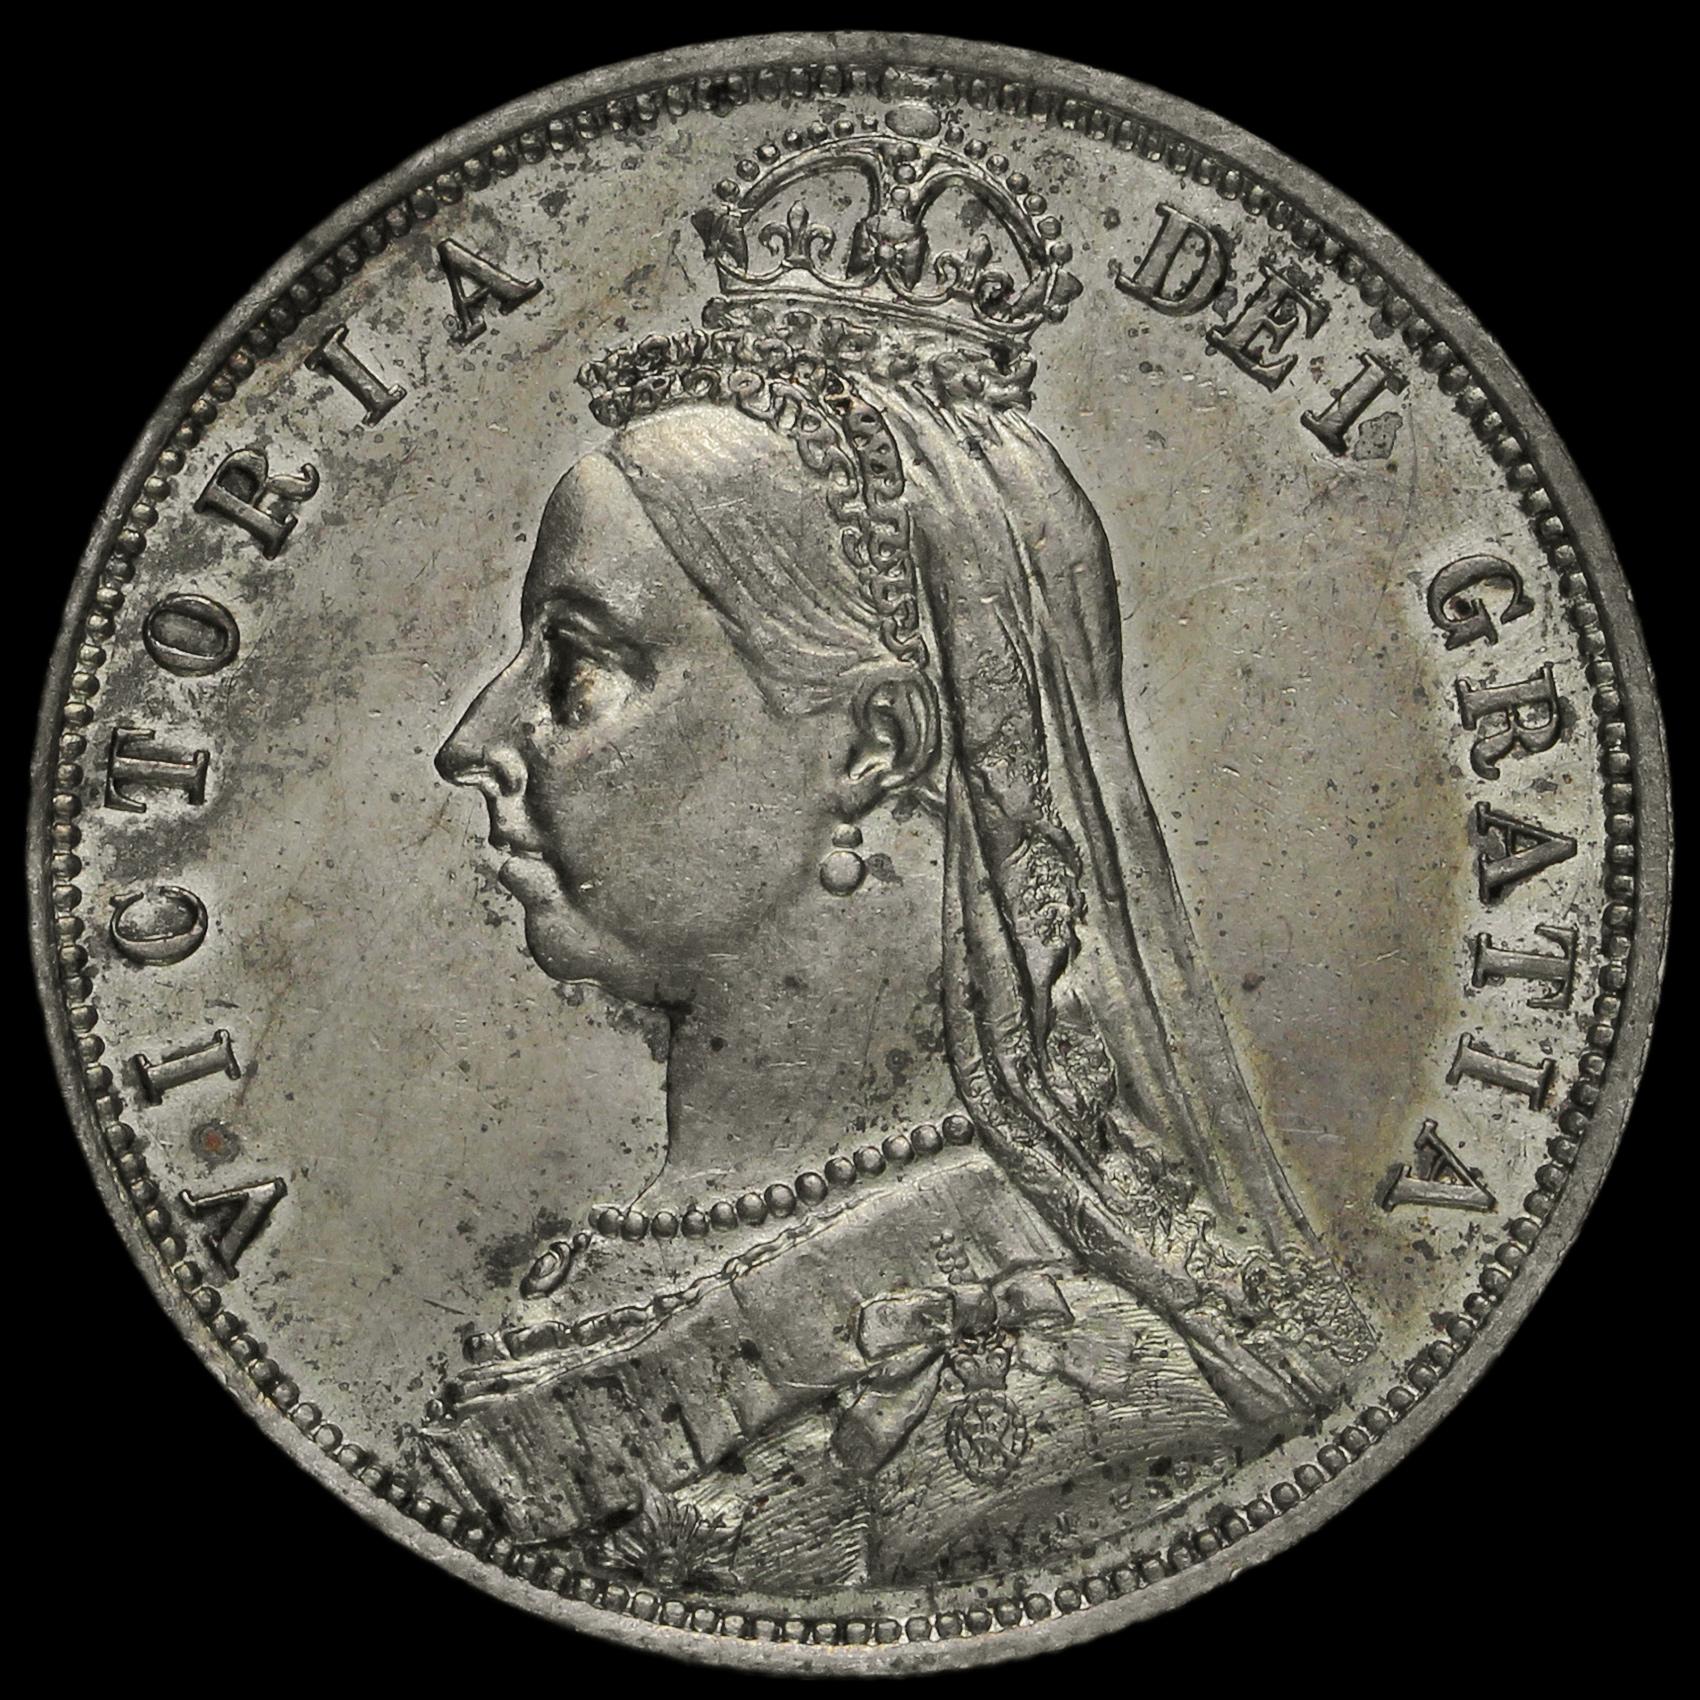 1887 Queen Victoria Jubilee Head Silver Half Crown